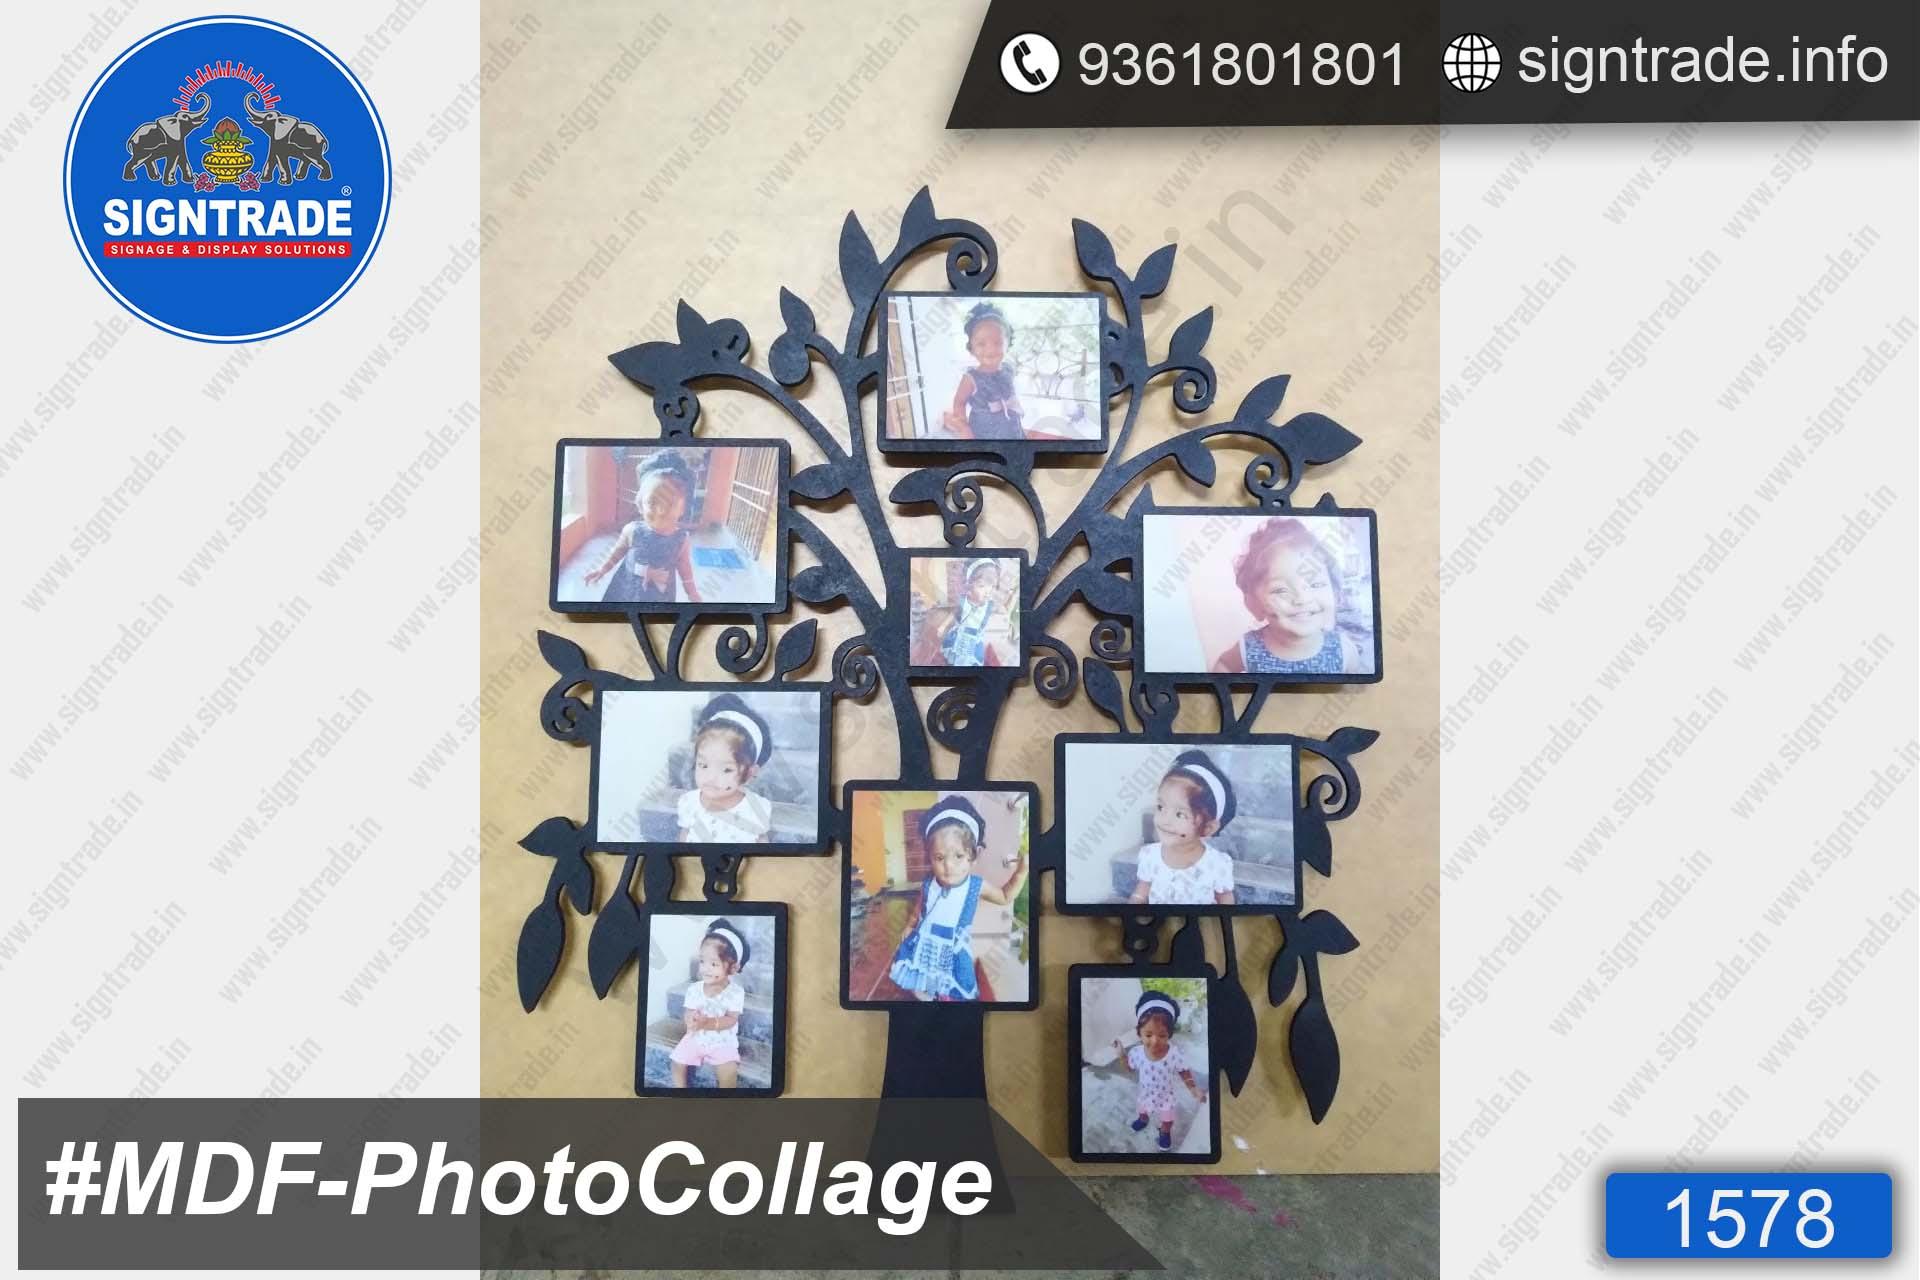 Kids Photo Collage, Black MDF Tree Shape Photo Collage, MDF Photo Collage, Photo Frame Manufacturer in Chennai